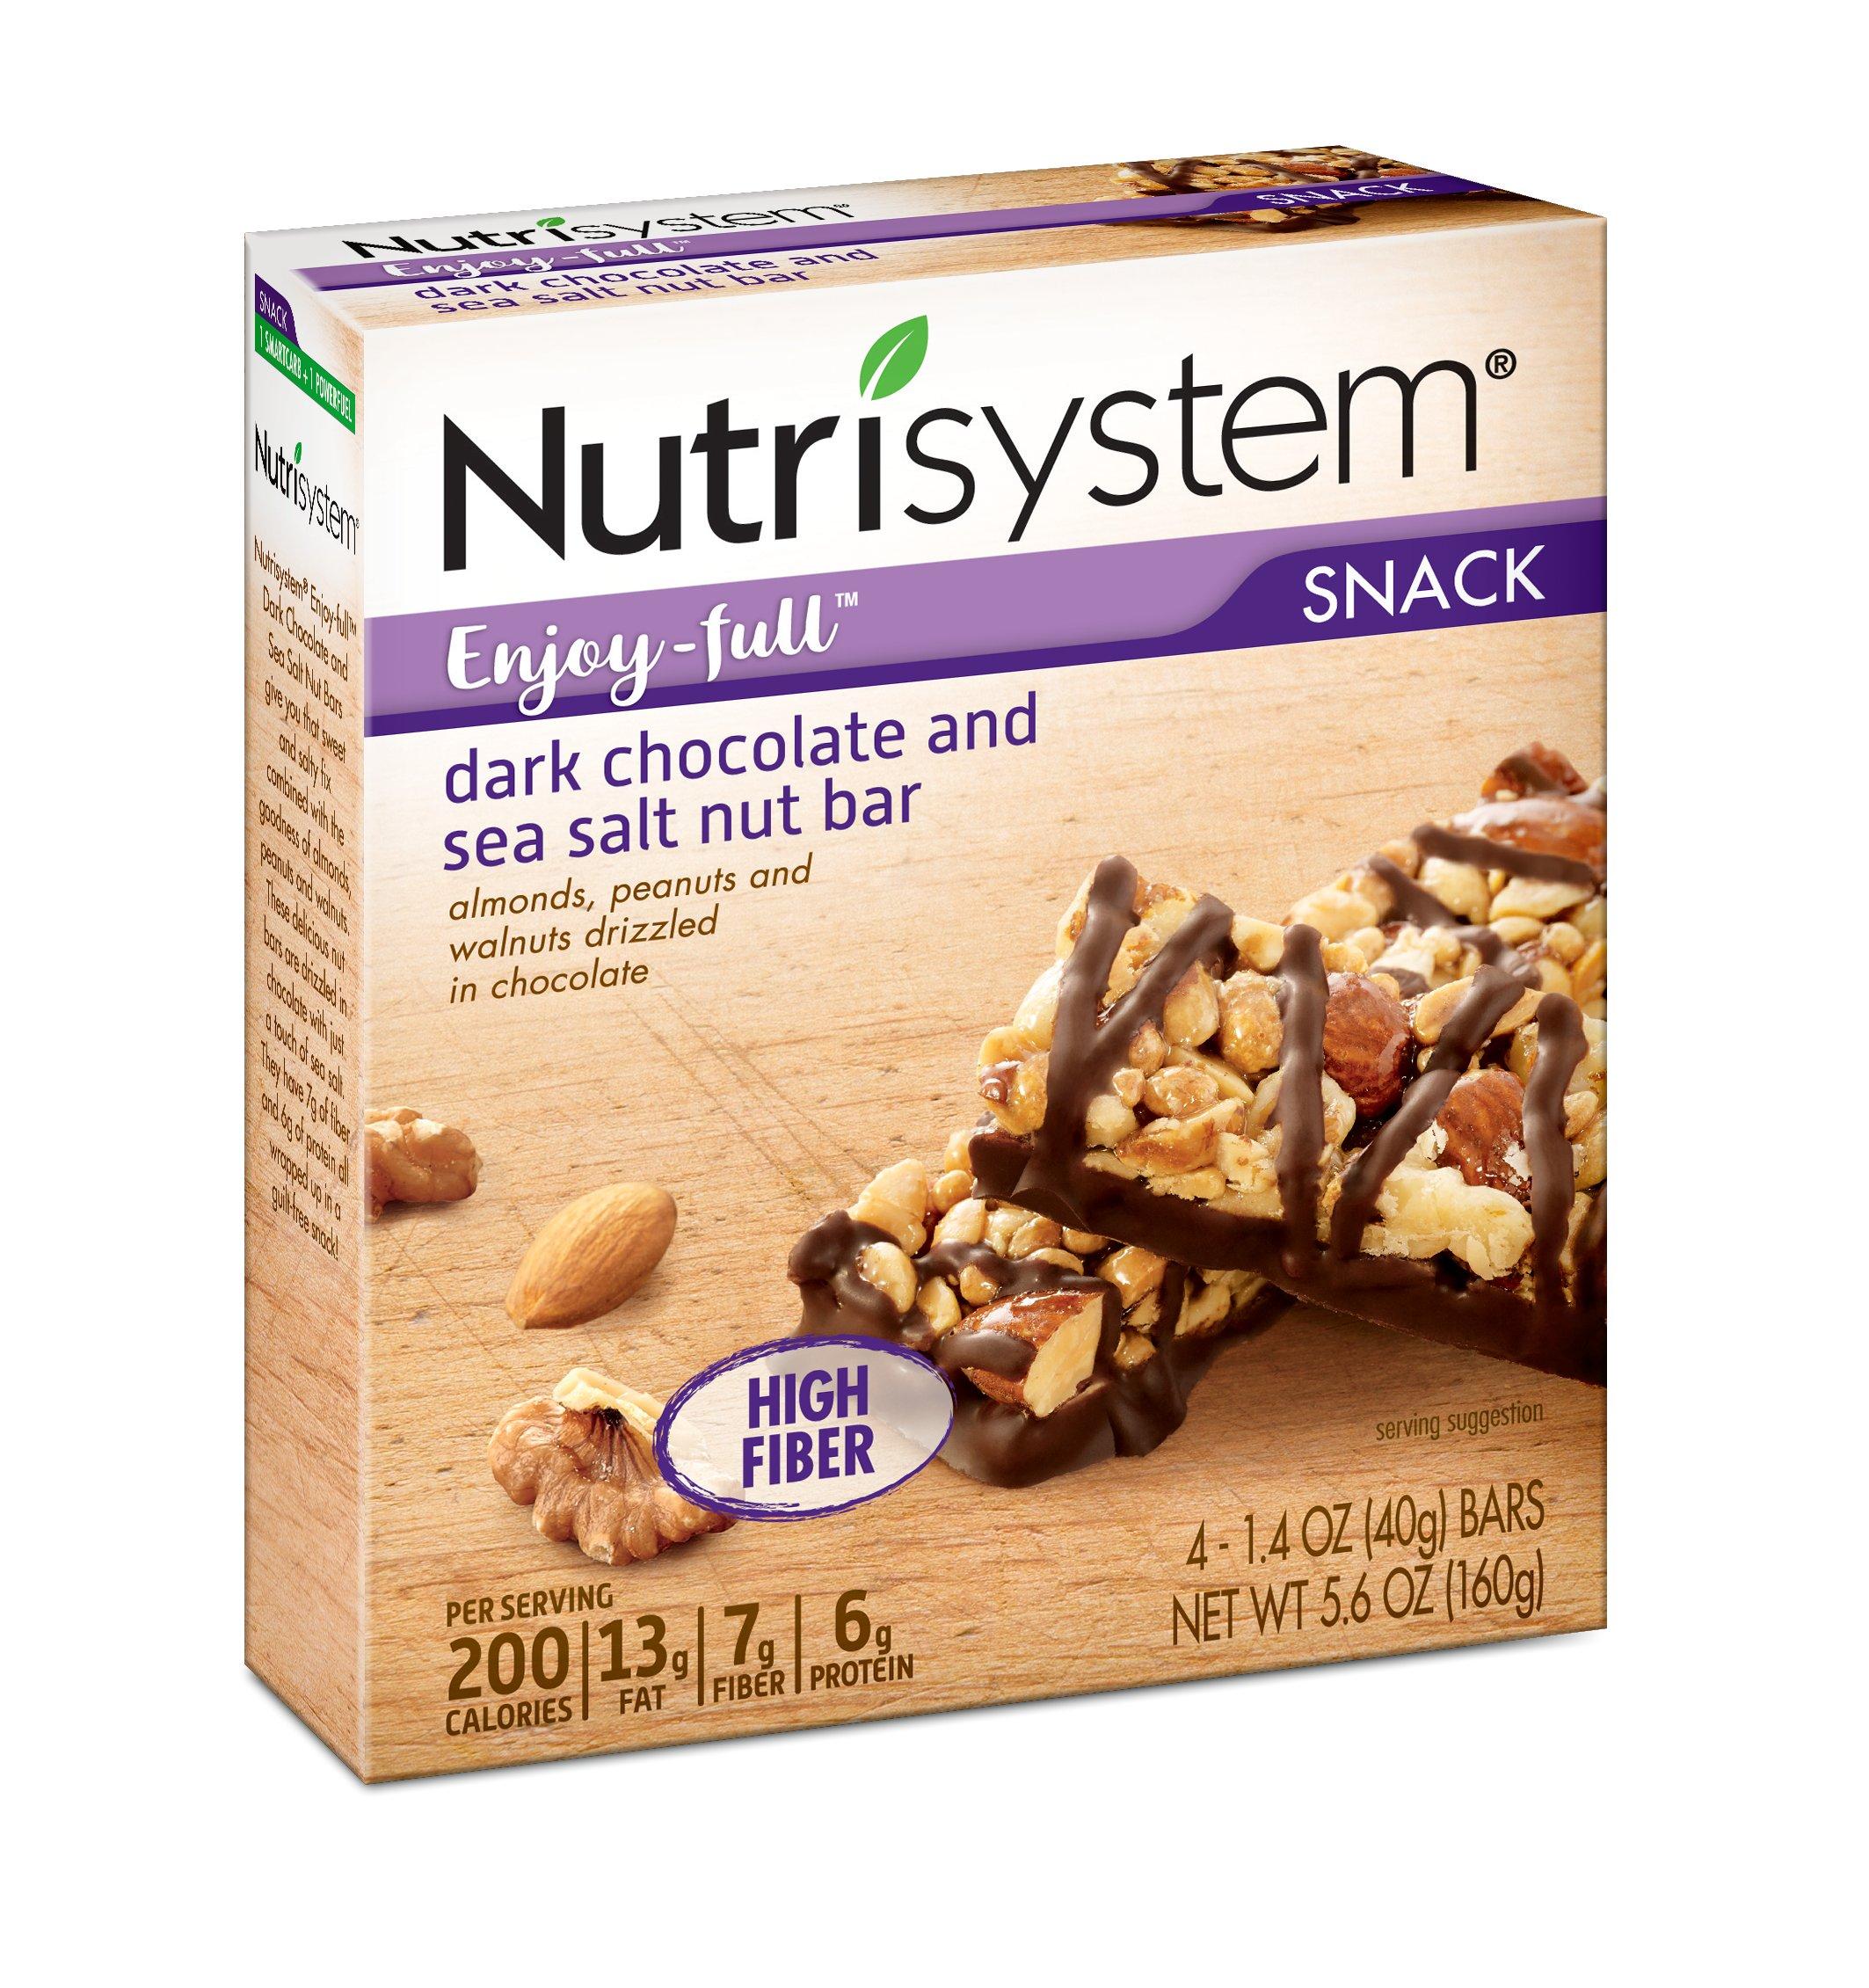 Nutrisystem® Enjoy-full™ Dark Chocolate and Sea Salt Nut Bars, 24 ct